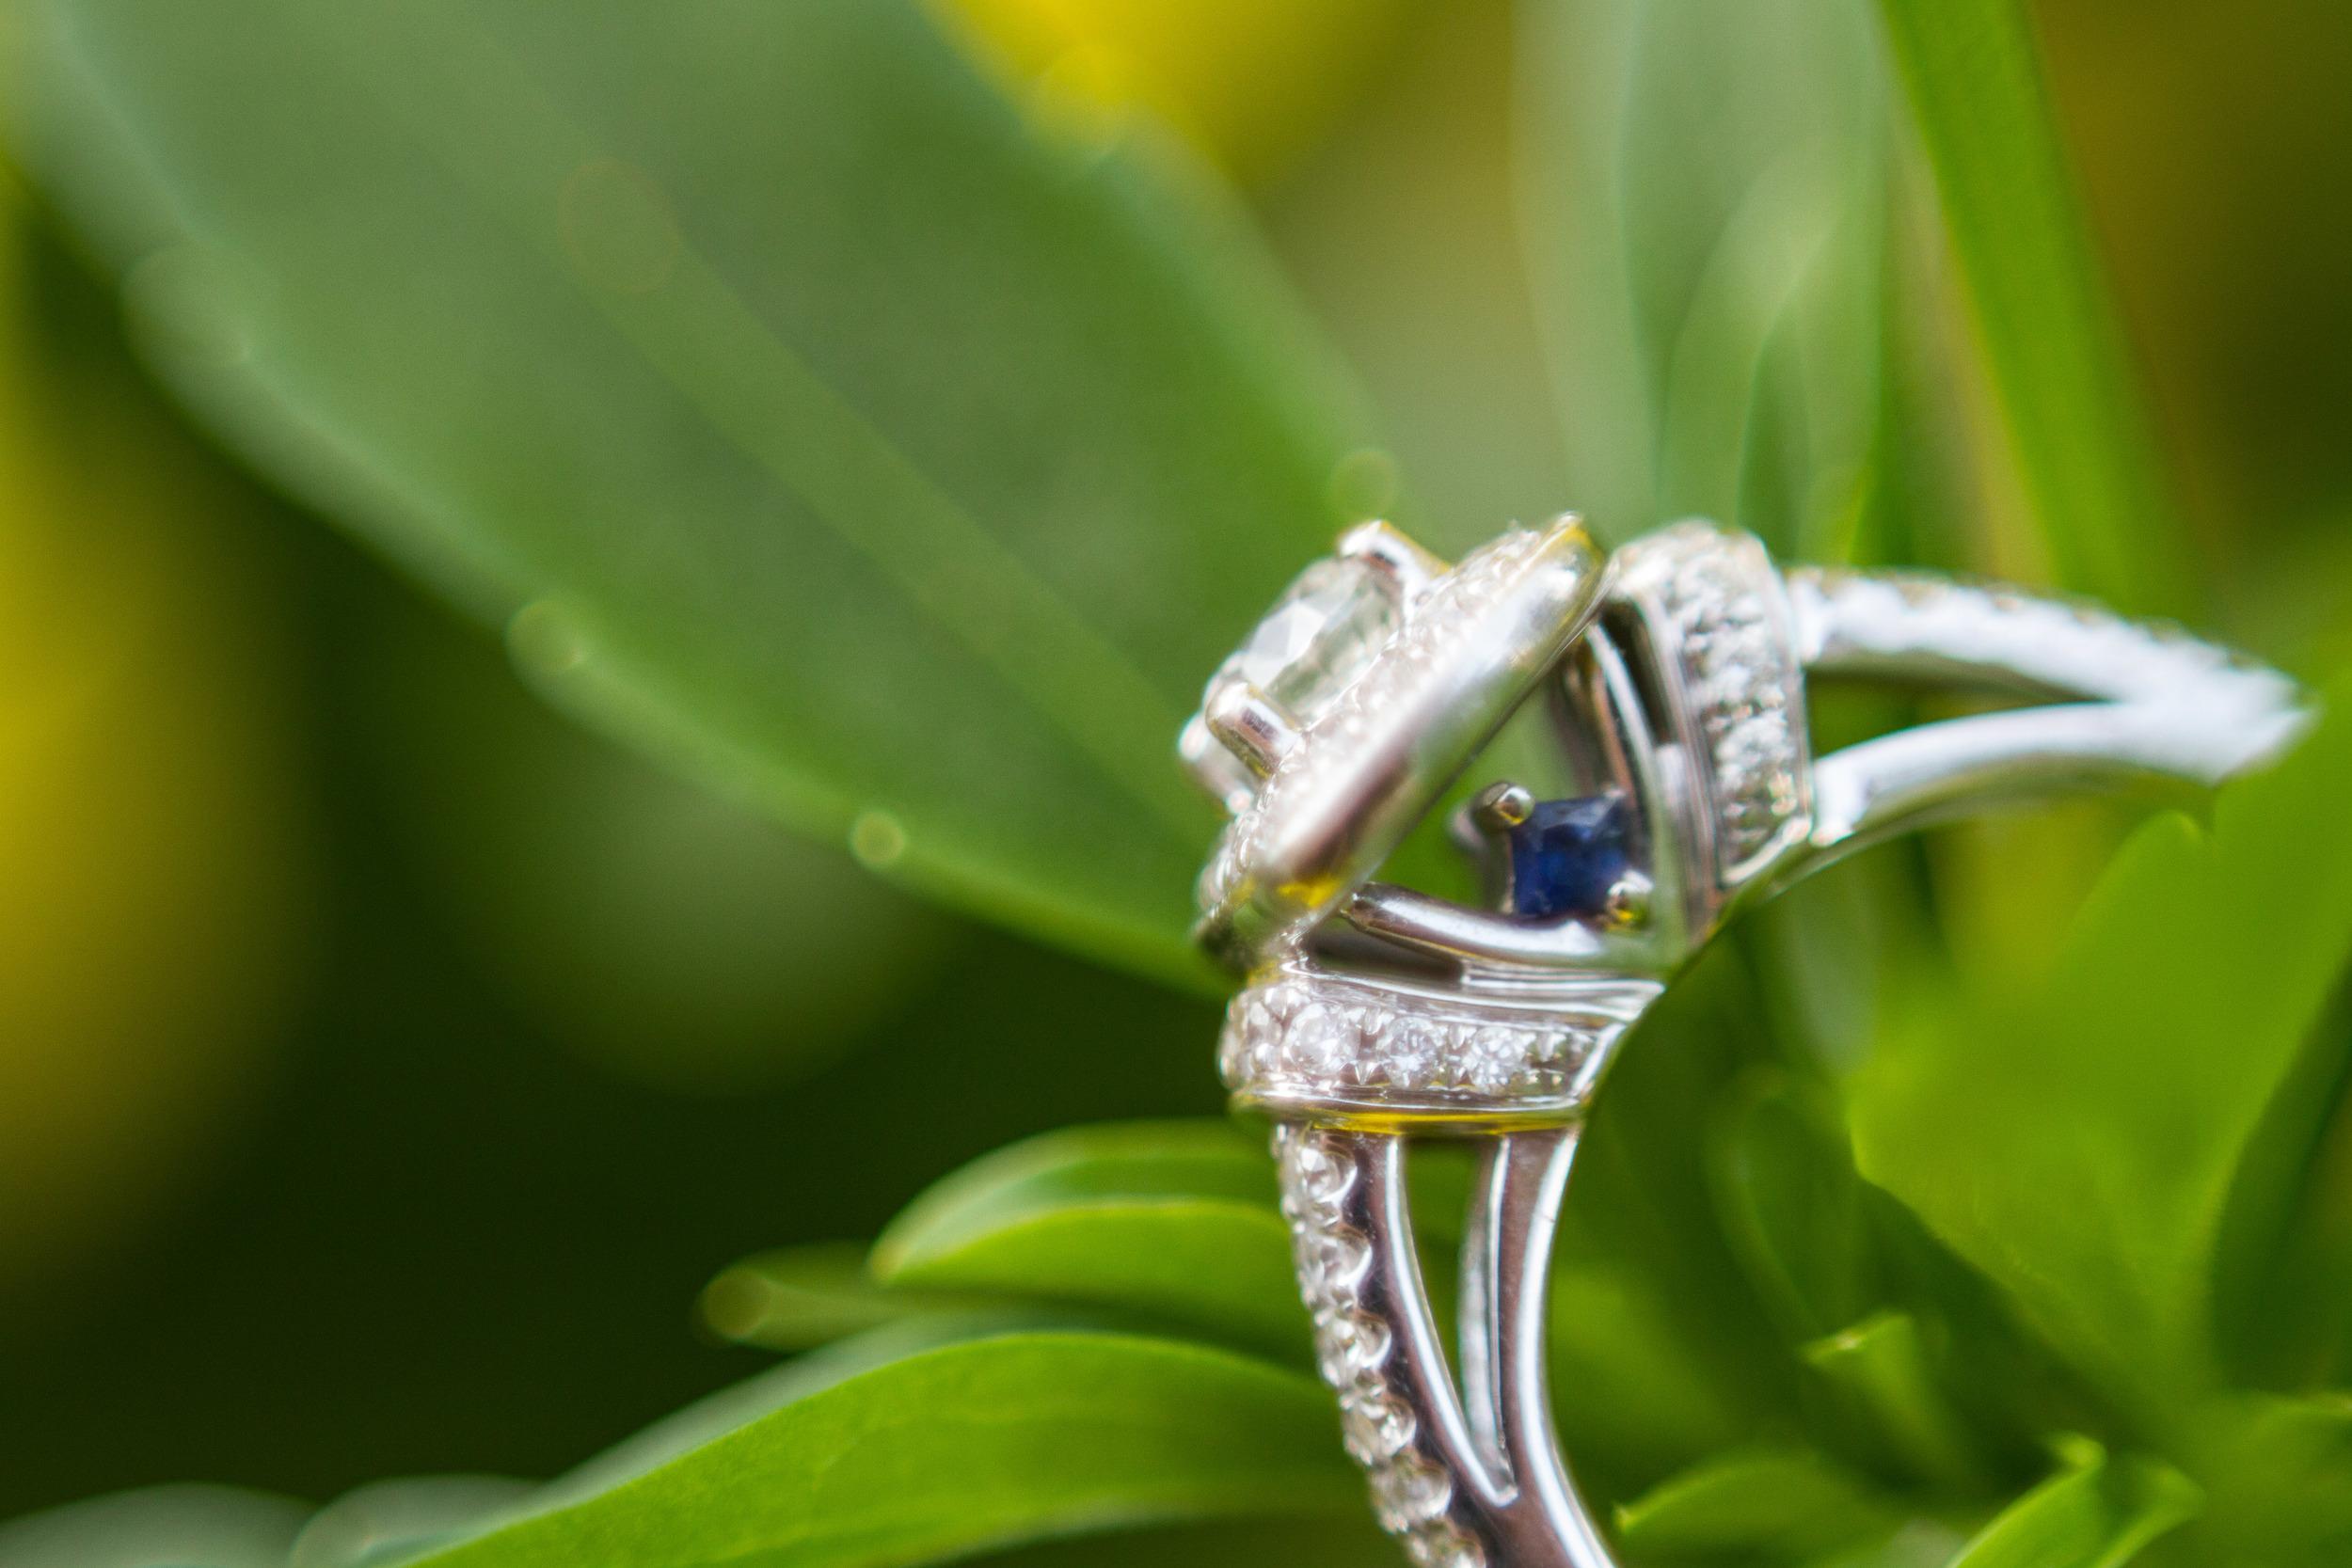 Blaylock Imagery McMenamins Edgefield Portland Oregon Engagement Ring Sapphire